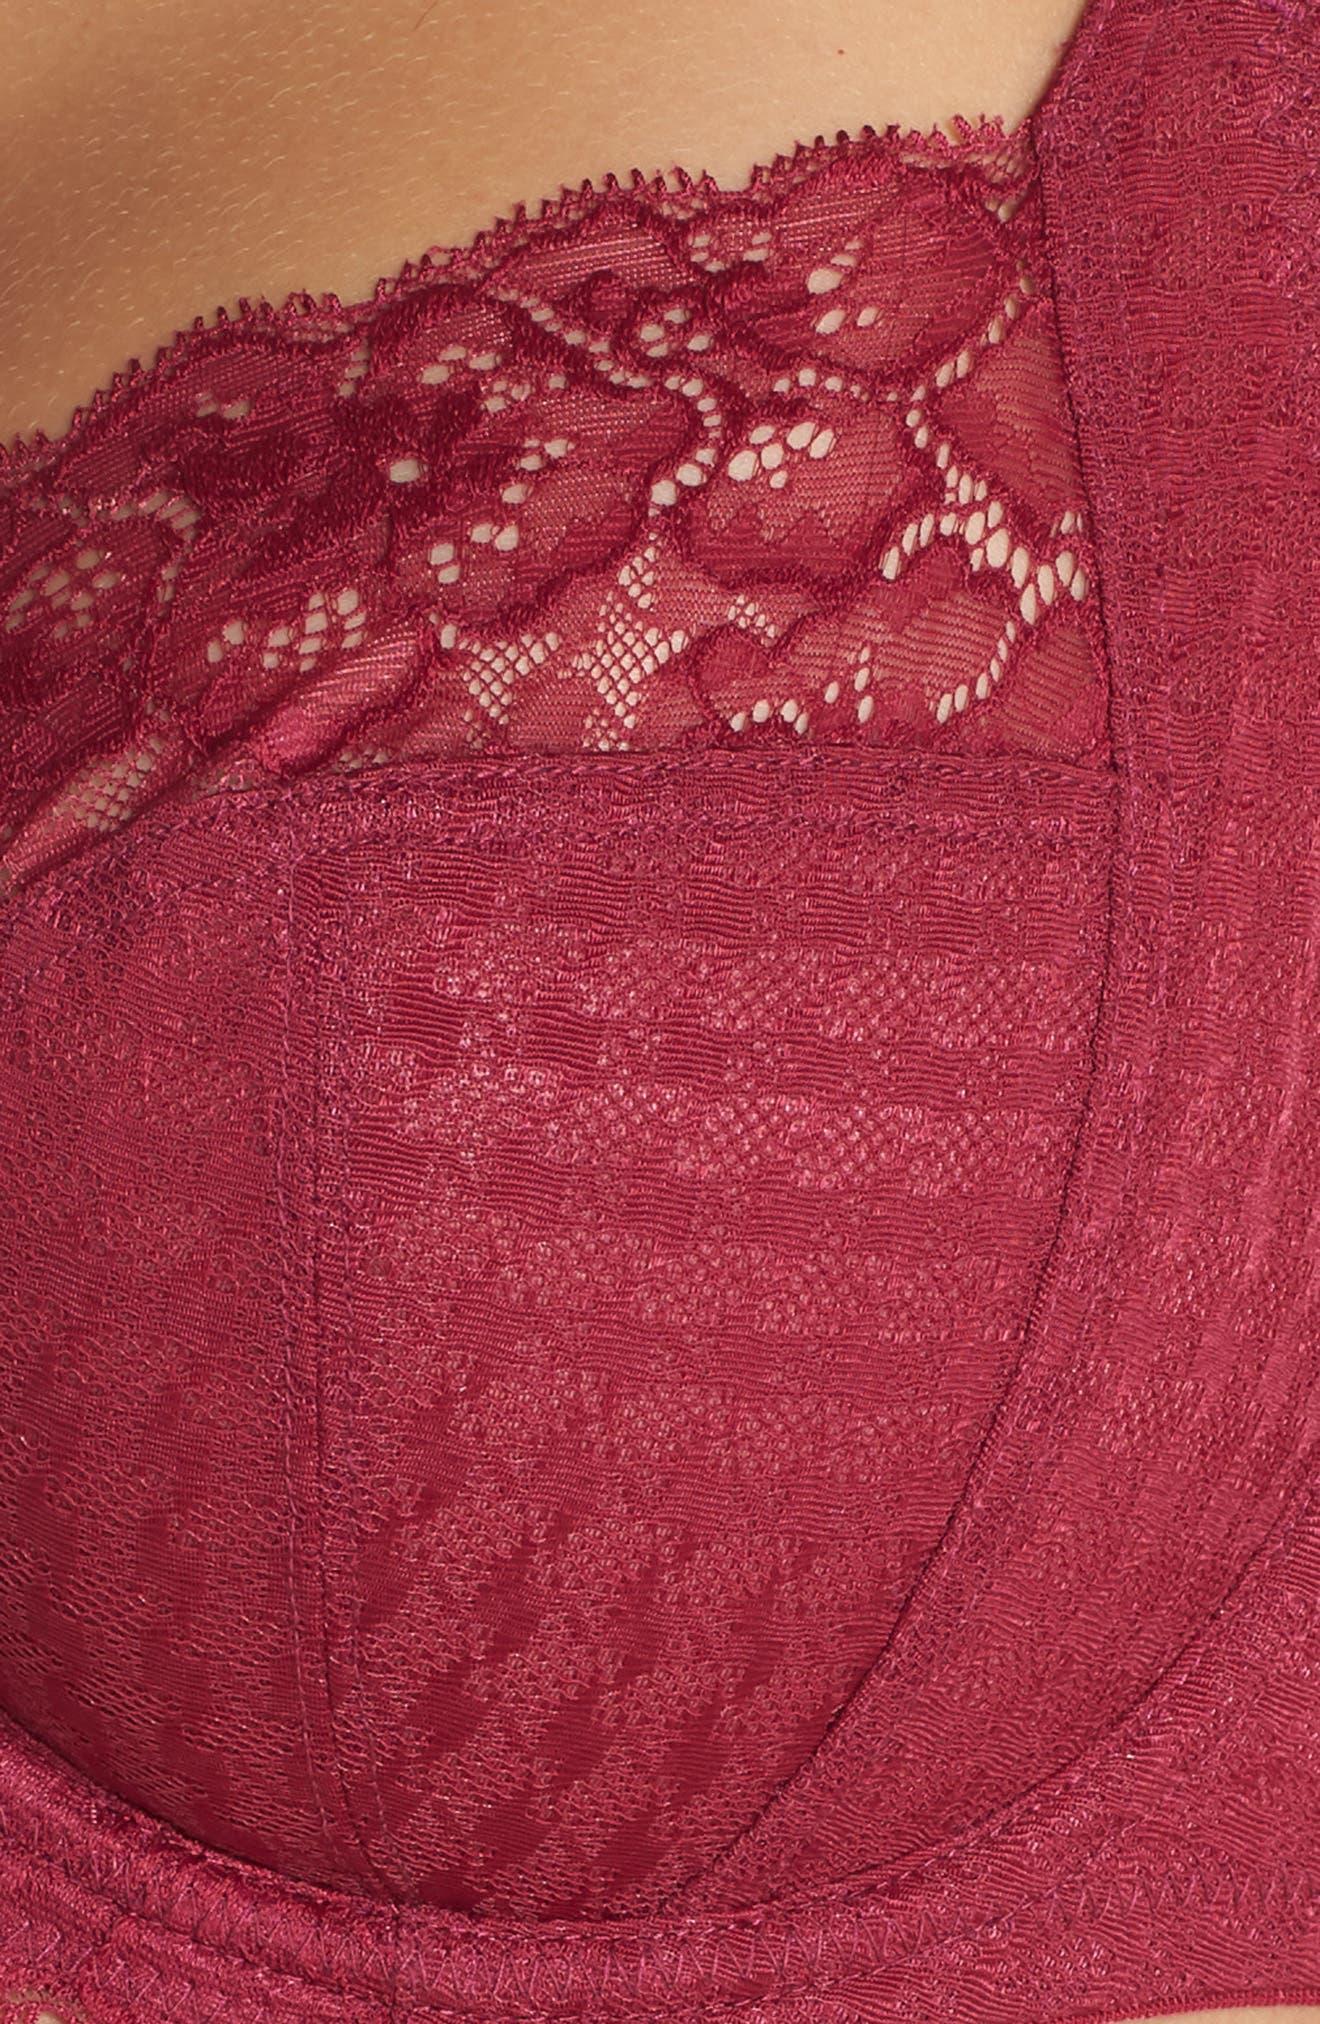 'Envy' Underwire Stretch Lace Bra,                             Alternate thumbnail 6, color,                             ROUGE